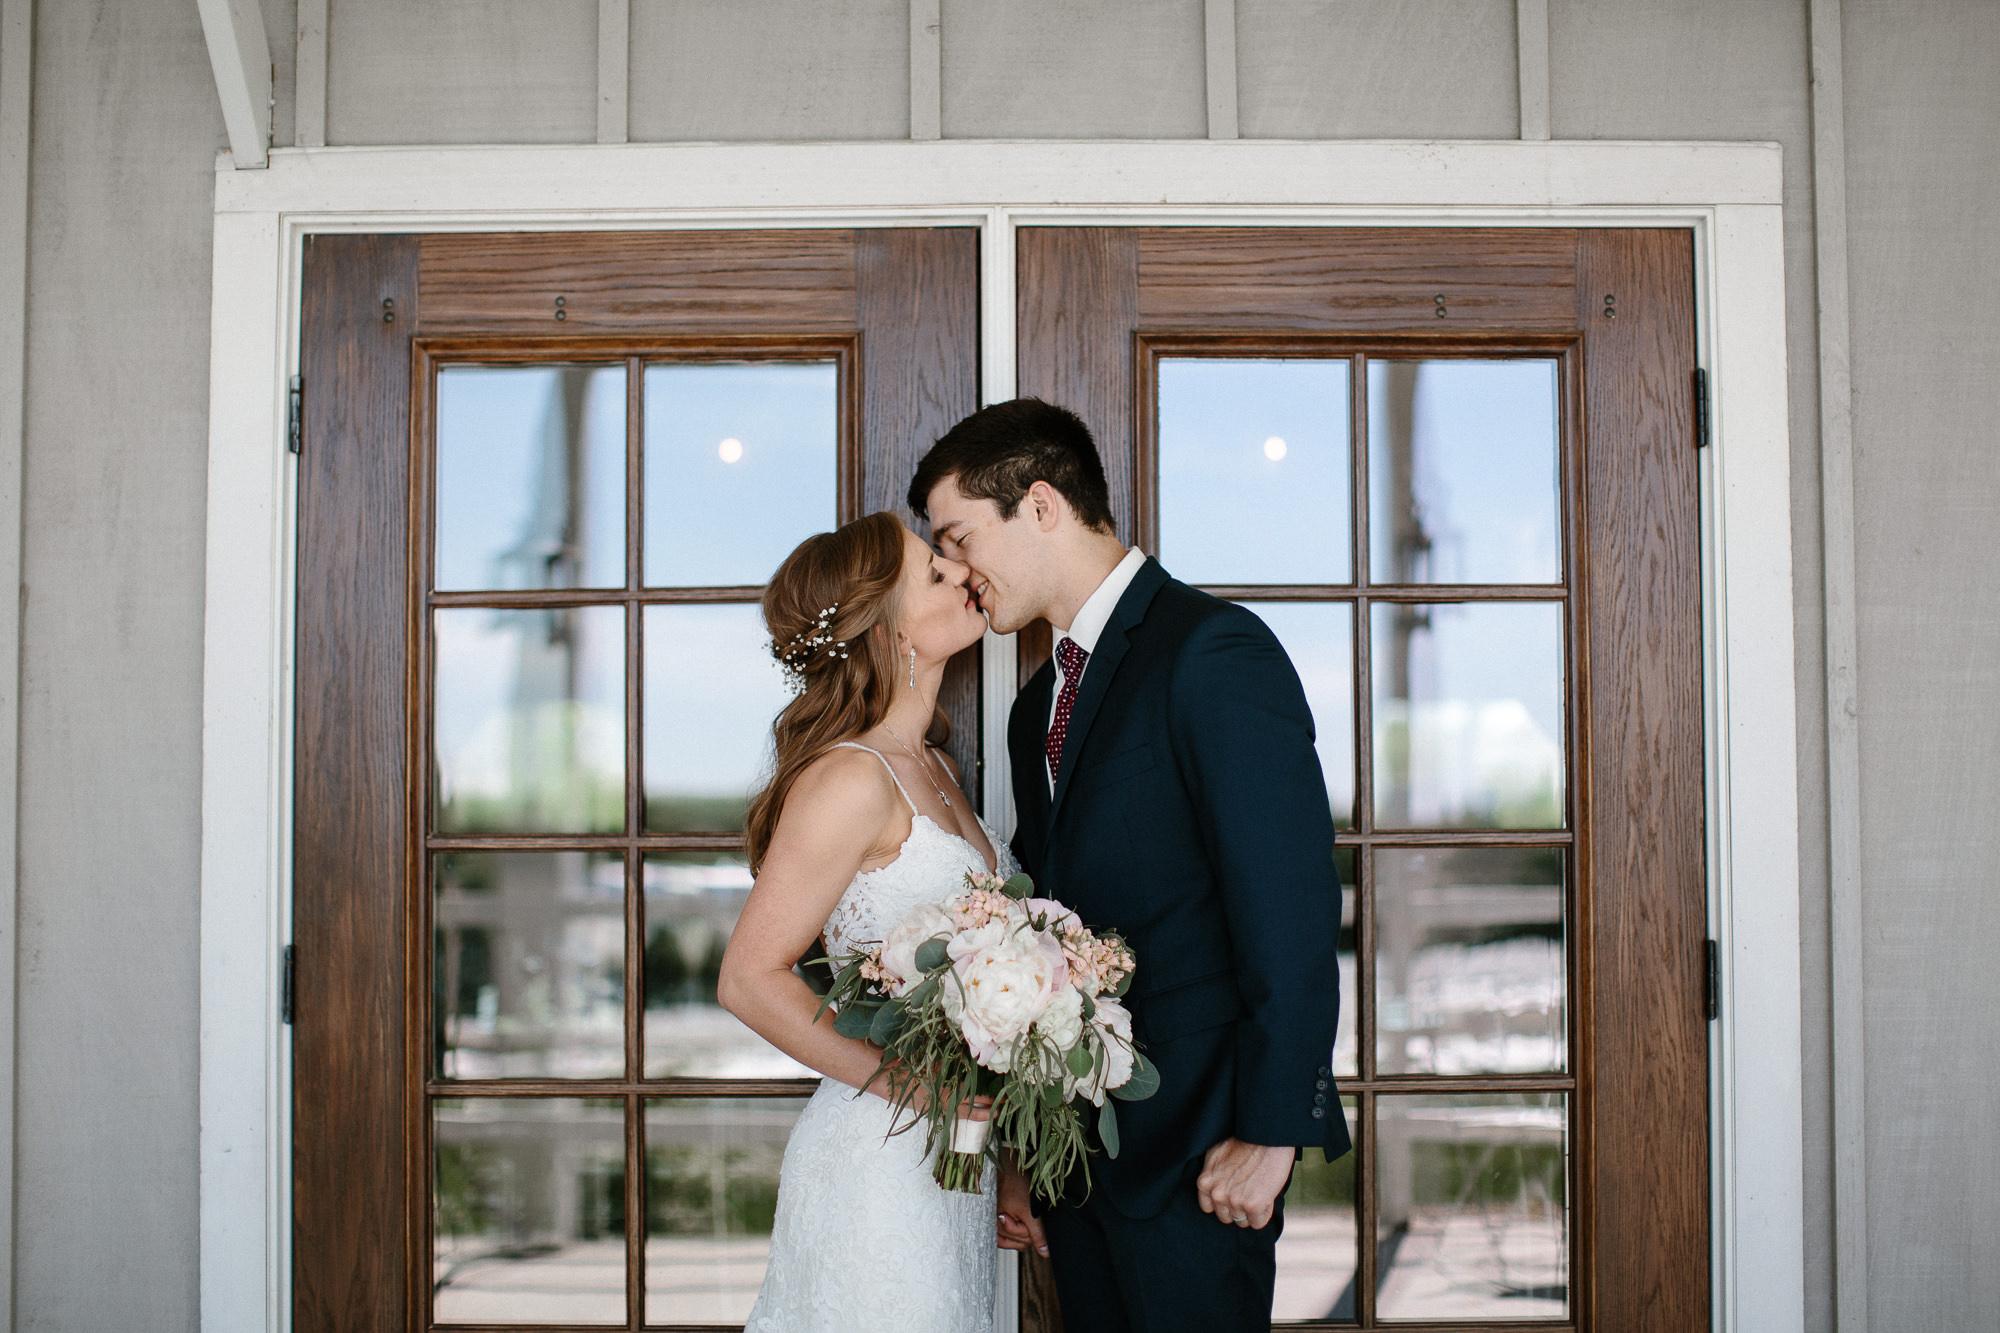 wedding-elopement-adventerous-romantic-timeless-south-dakota-blue-haven-barn-027.jpg